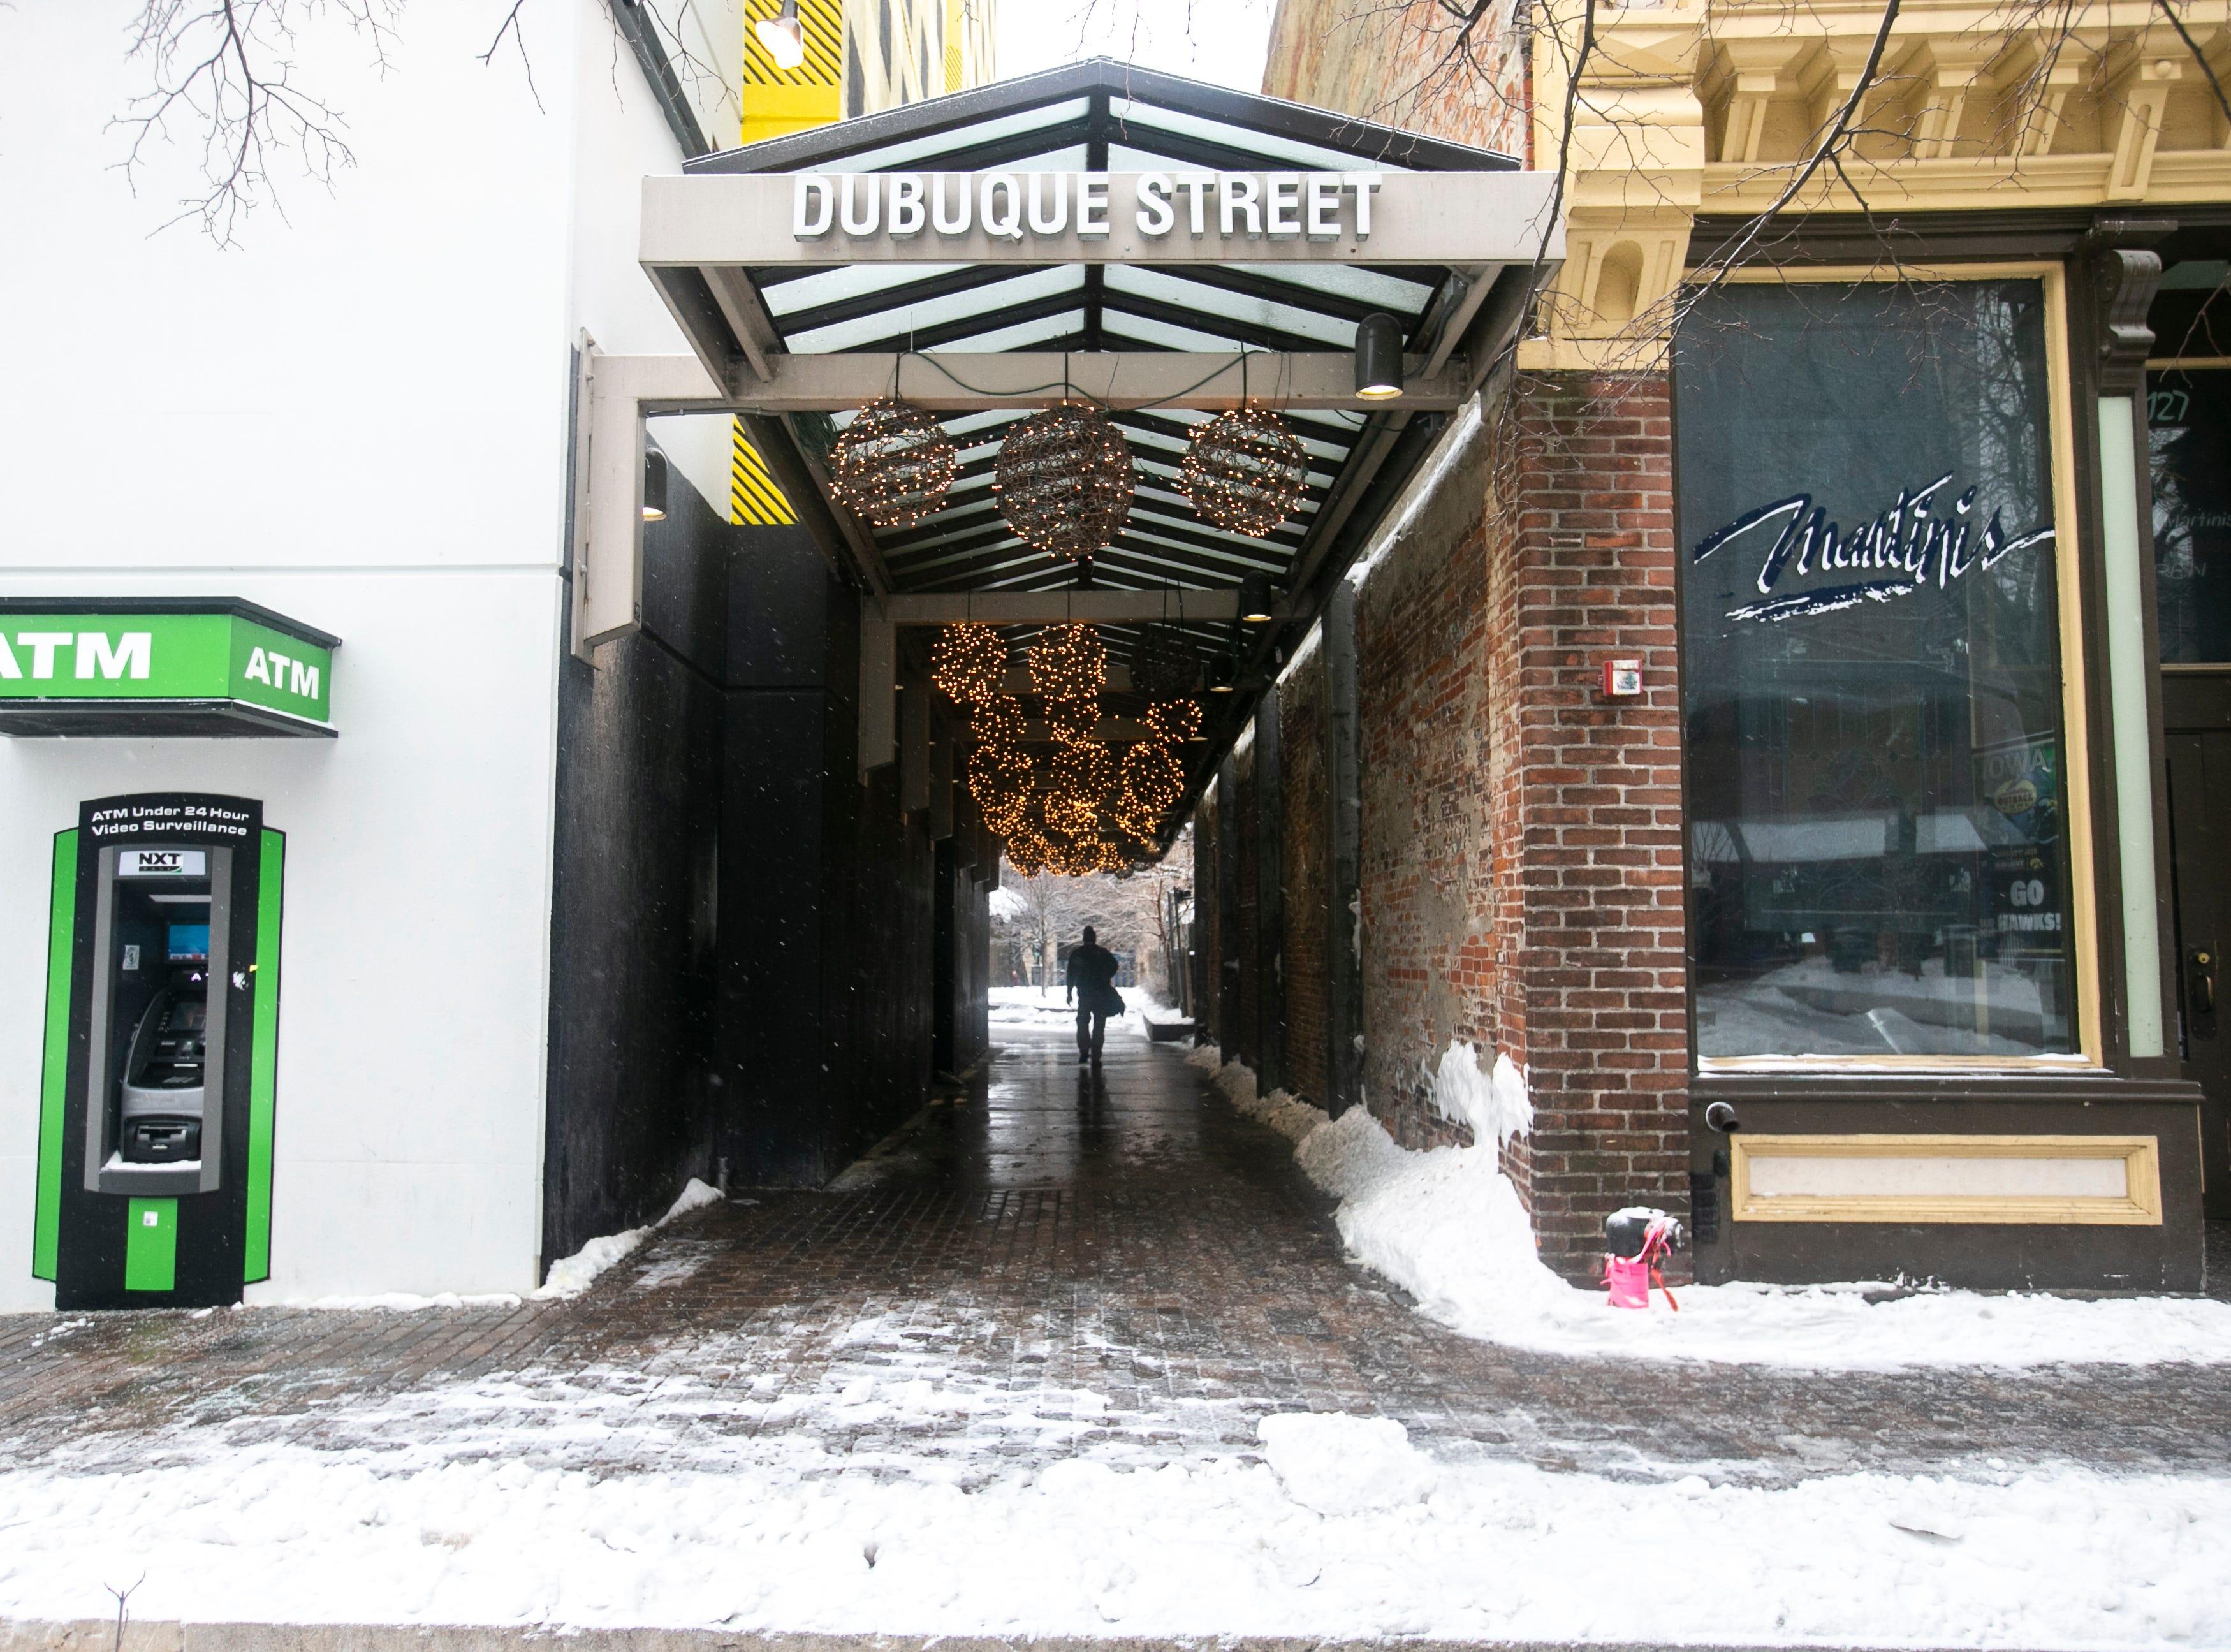 A person walks down a tunnel towards Dubuque Street as light snow falls on Tuesday, Jan. 22, 2019, along the pedestrian mall in Iowa City, Iowa.